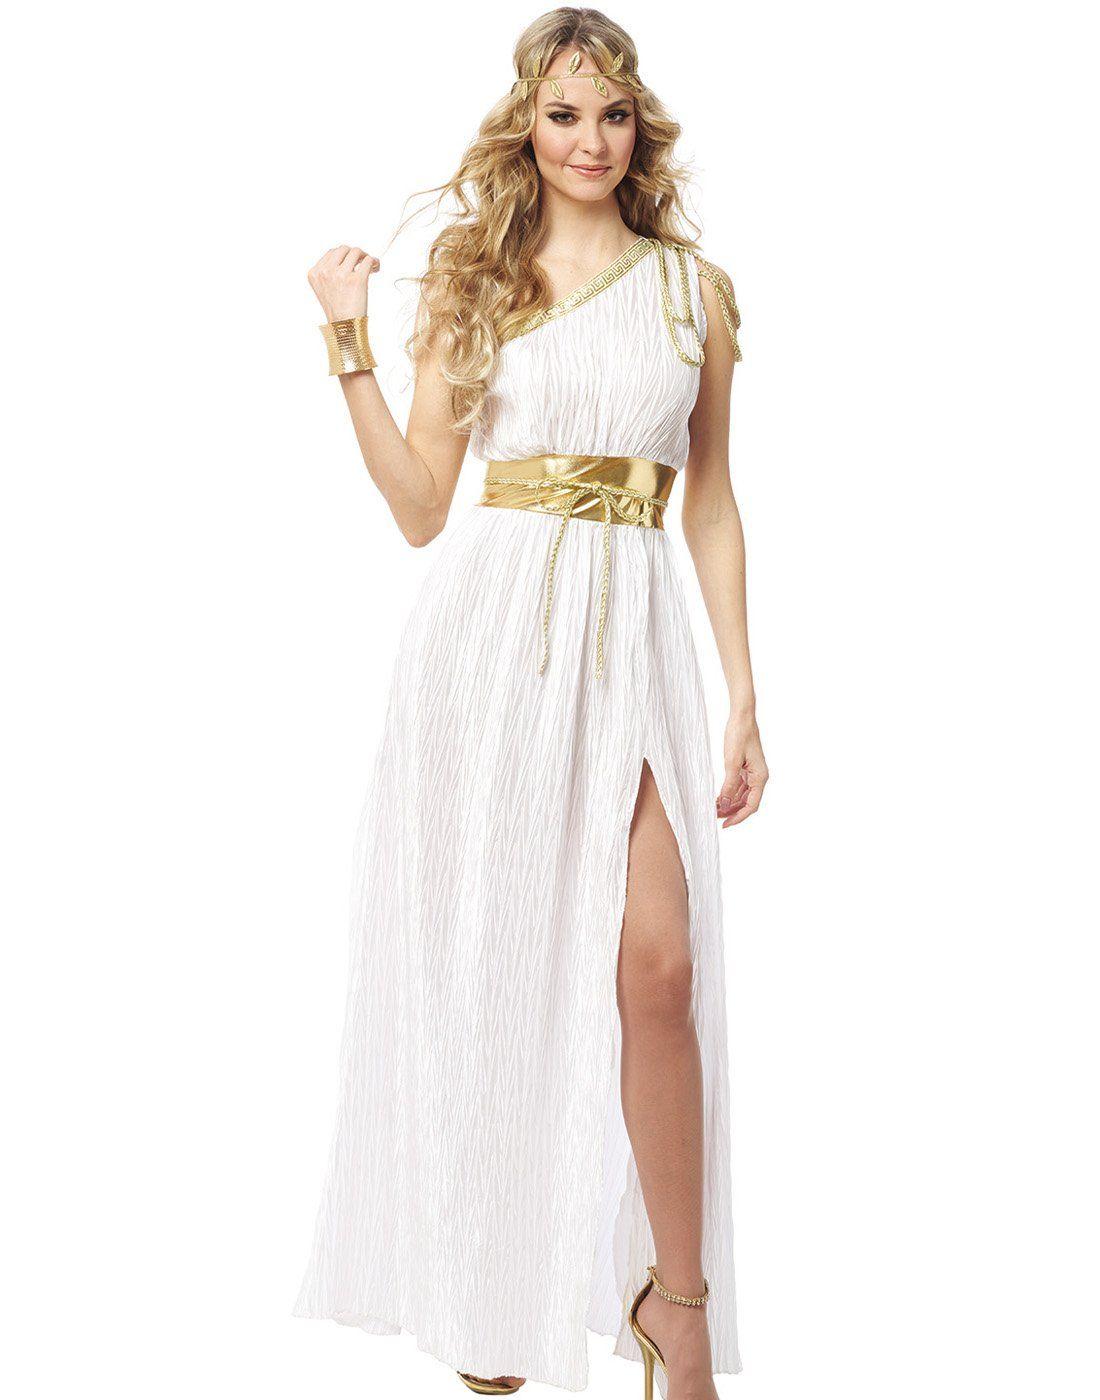 GREEK GODDESS APHRODITE COSTUME Toga Party Cleopatra Costume